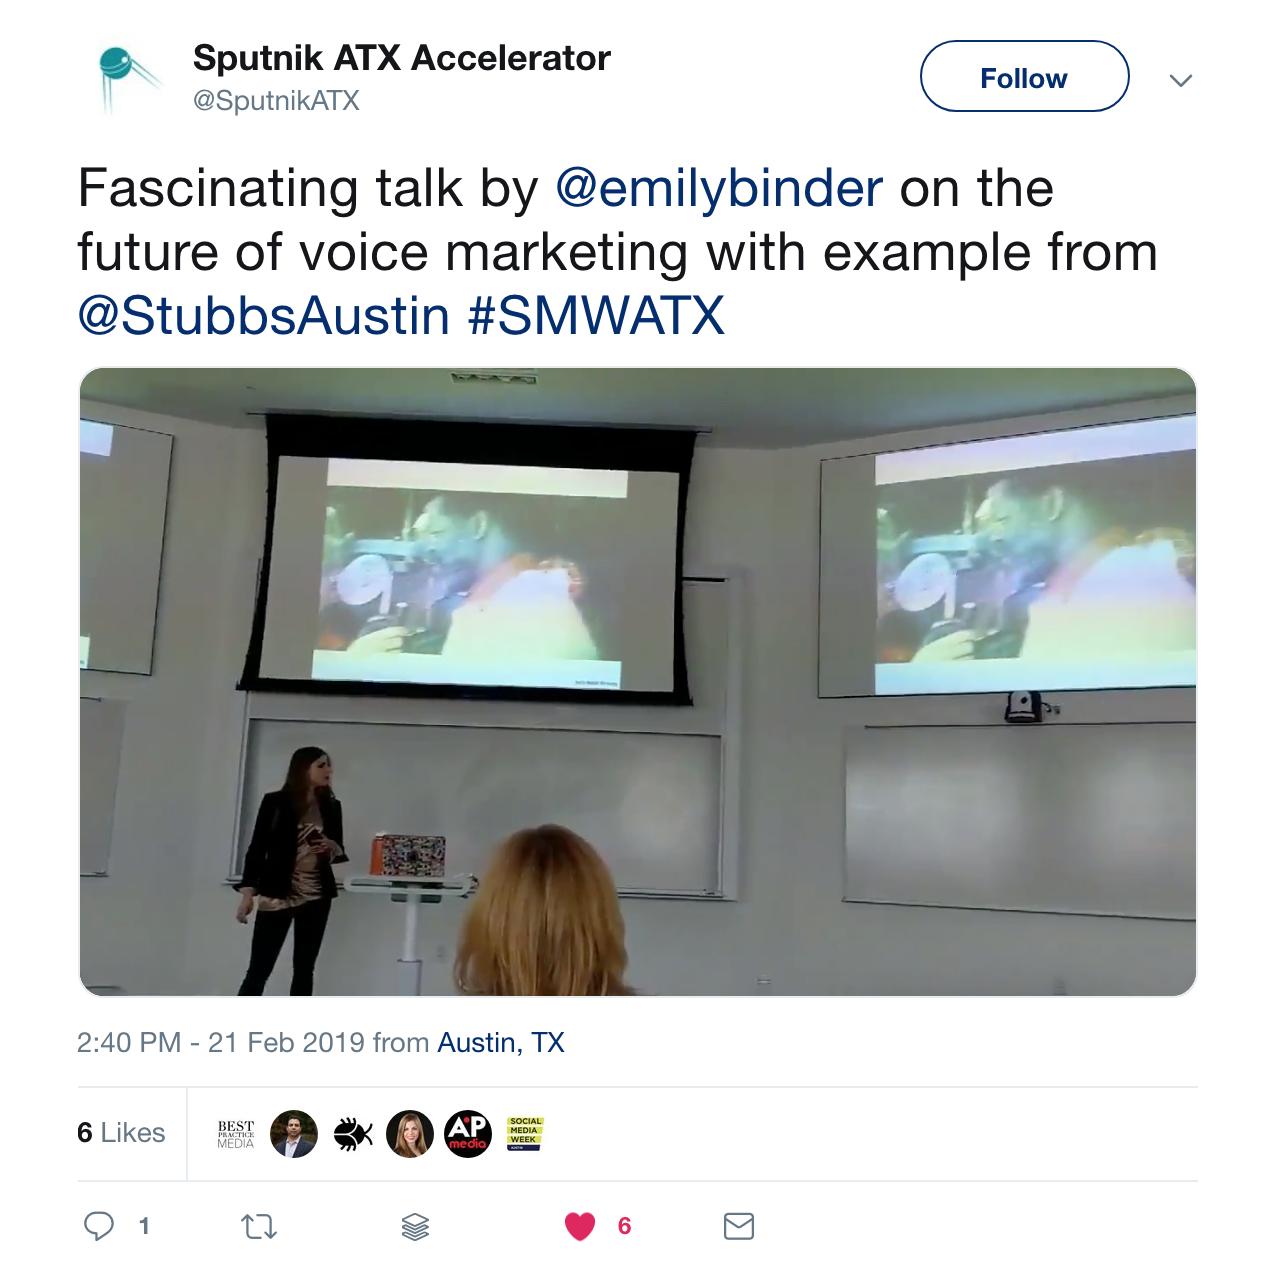 smwatx-emily-binder-stubbs-alexa-skill-voice-marketing-speaker.png